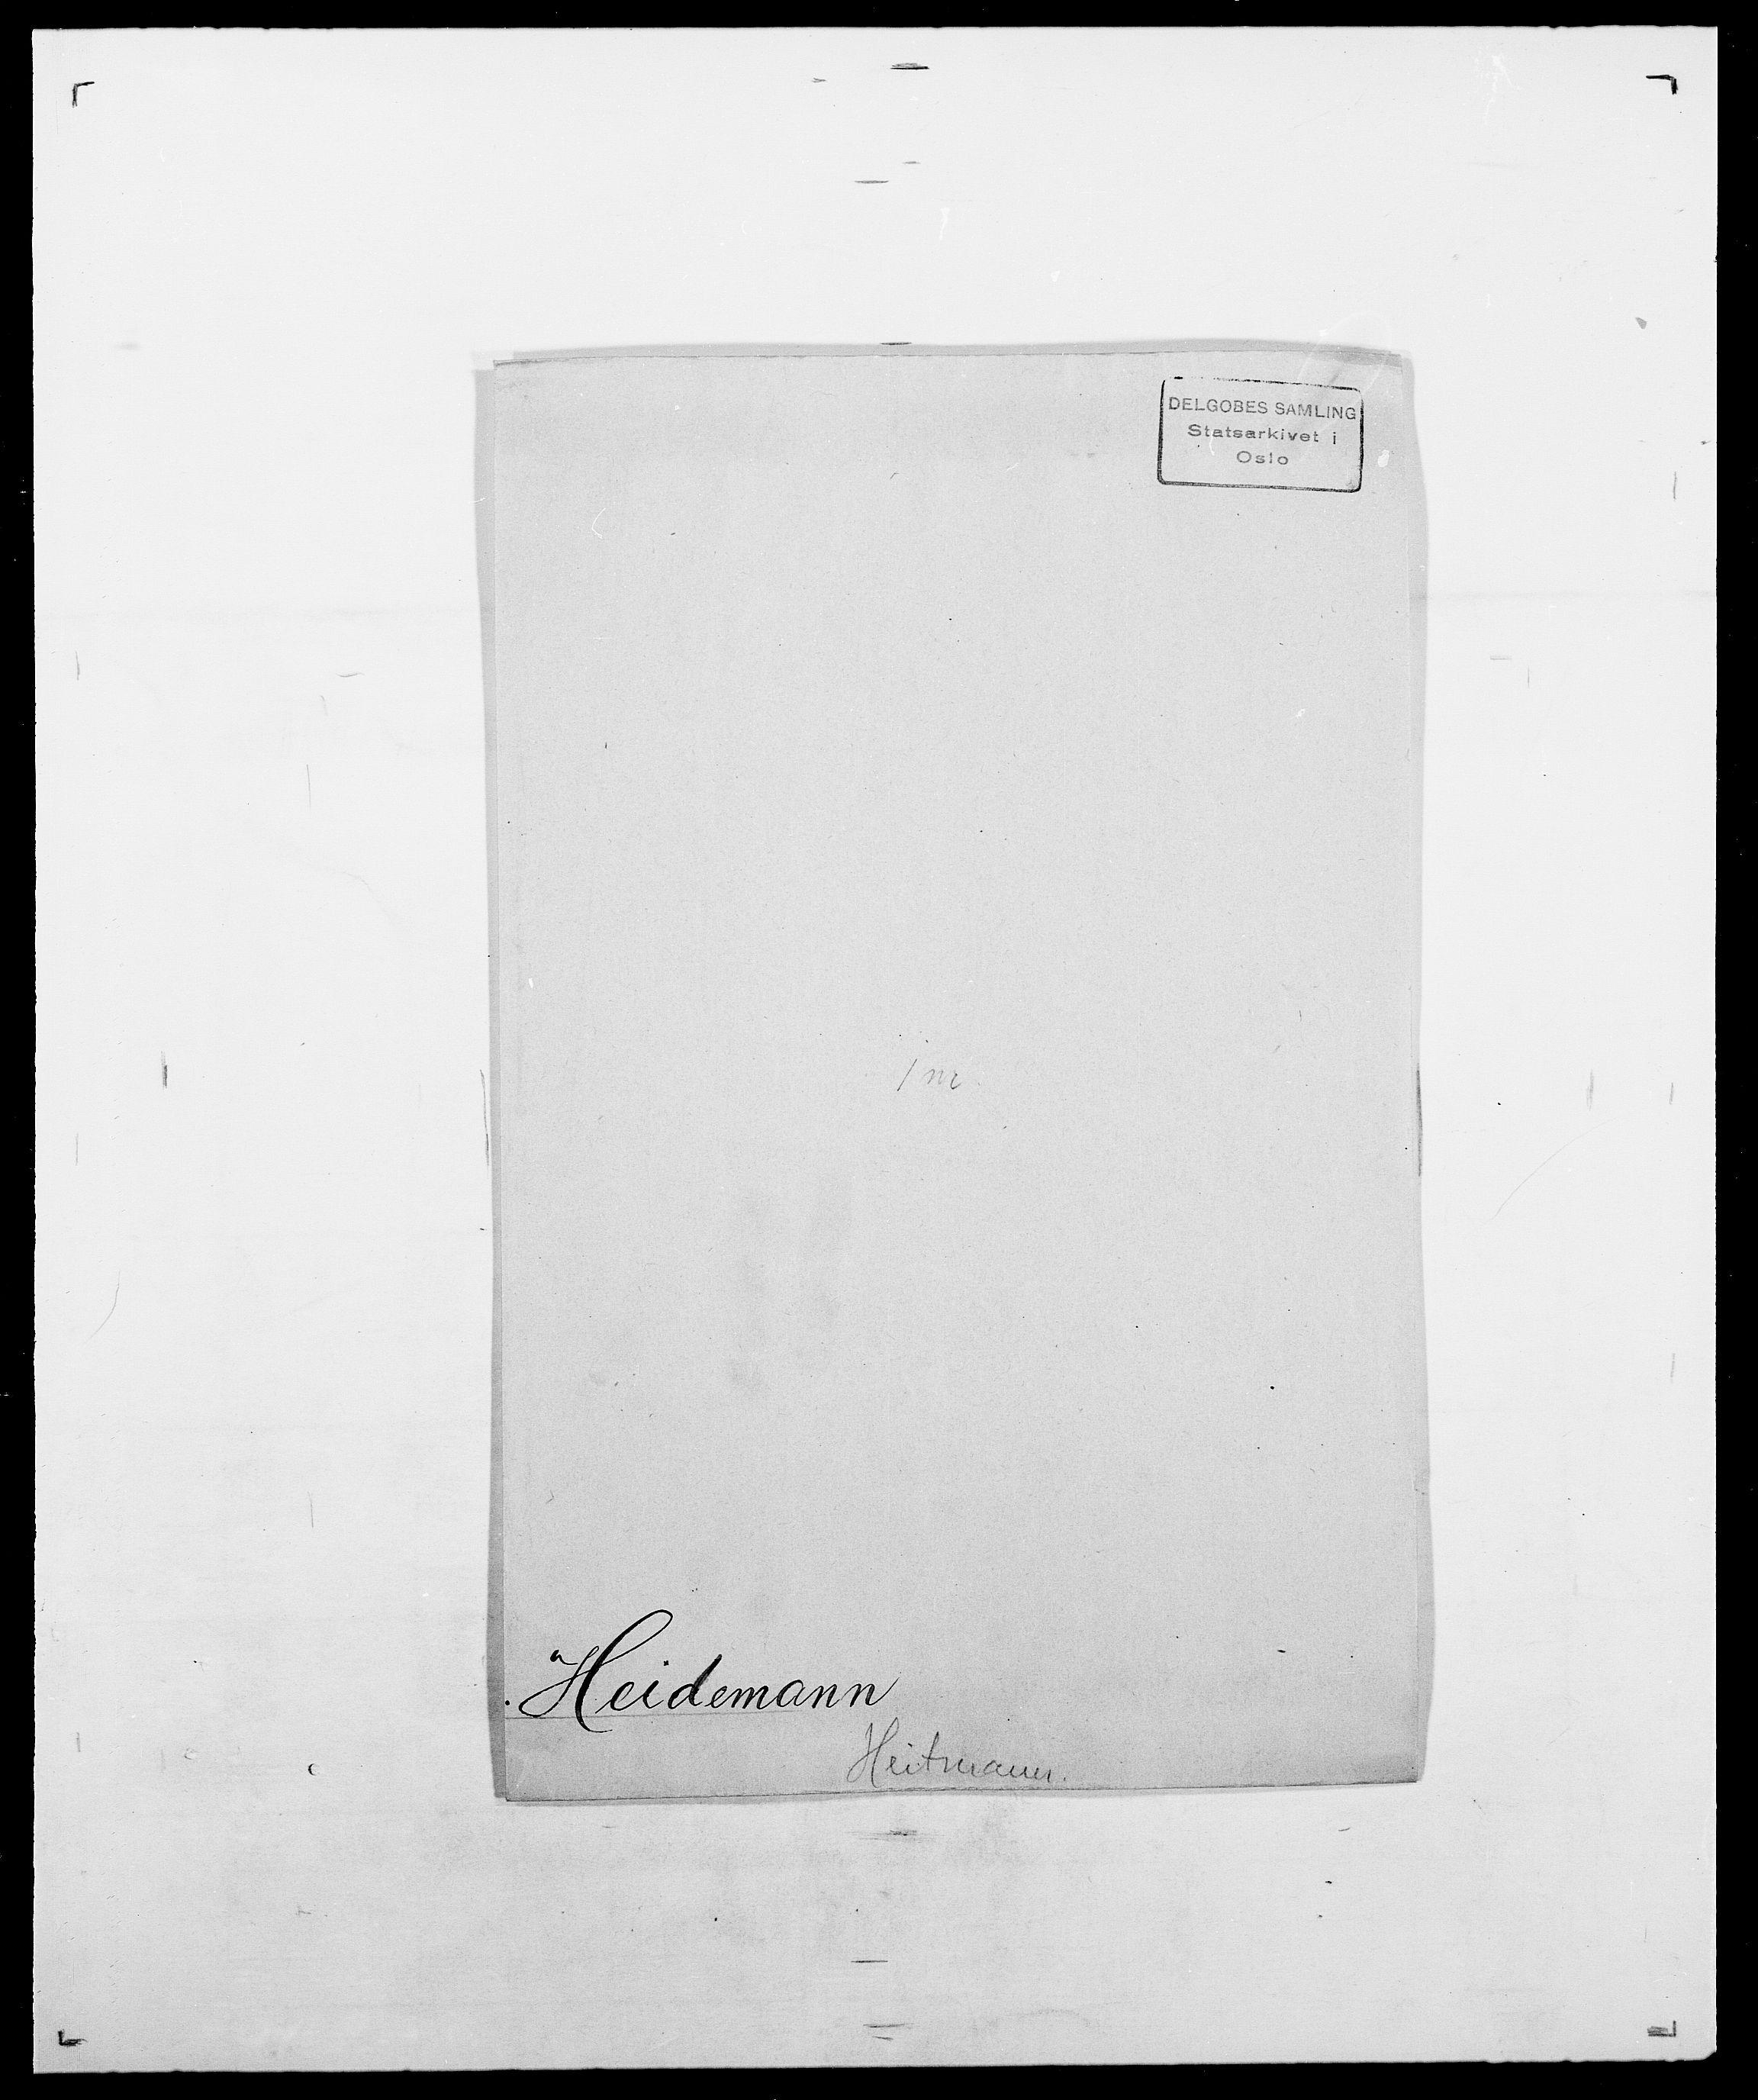 SAO, Delgobe, Charles Antoine - samling, D/Da/L0016: Hamborg - Hektoen, s. 812